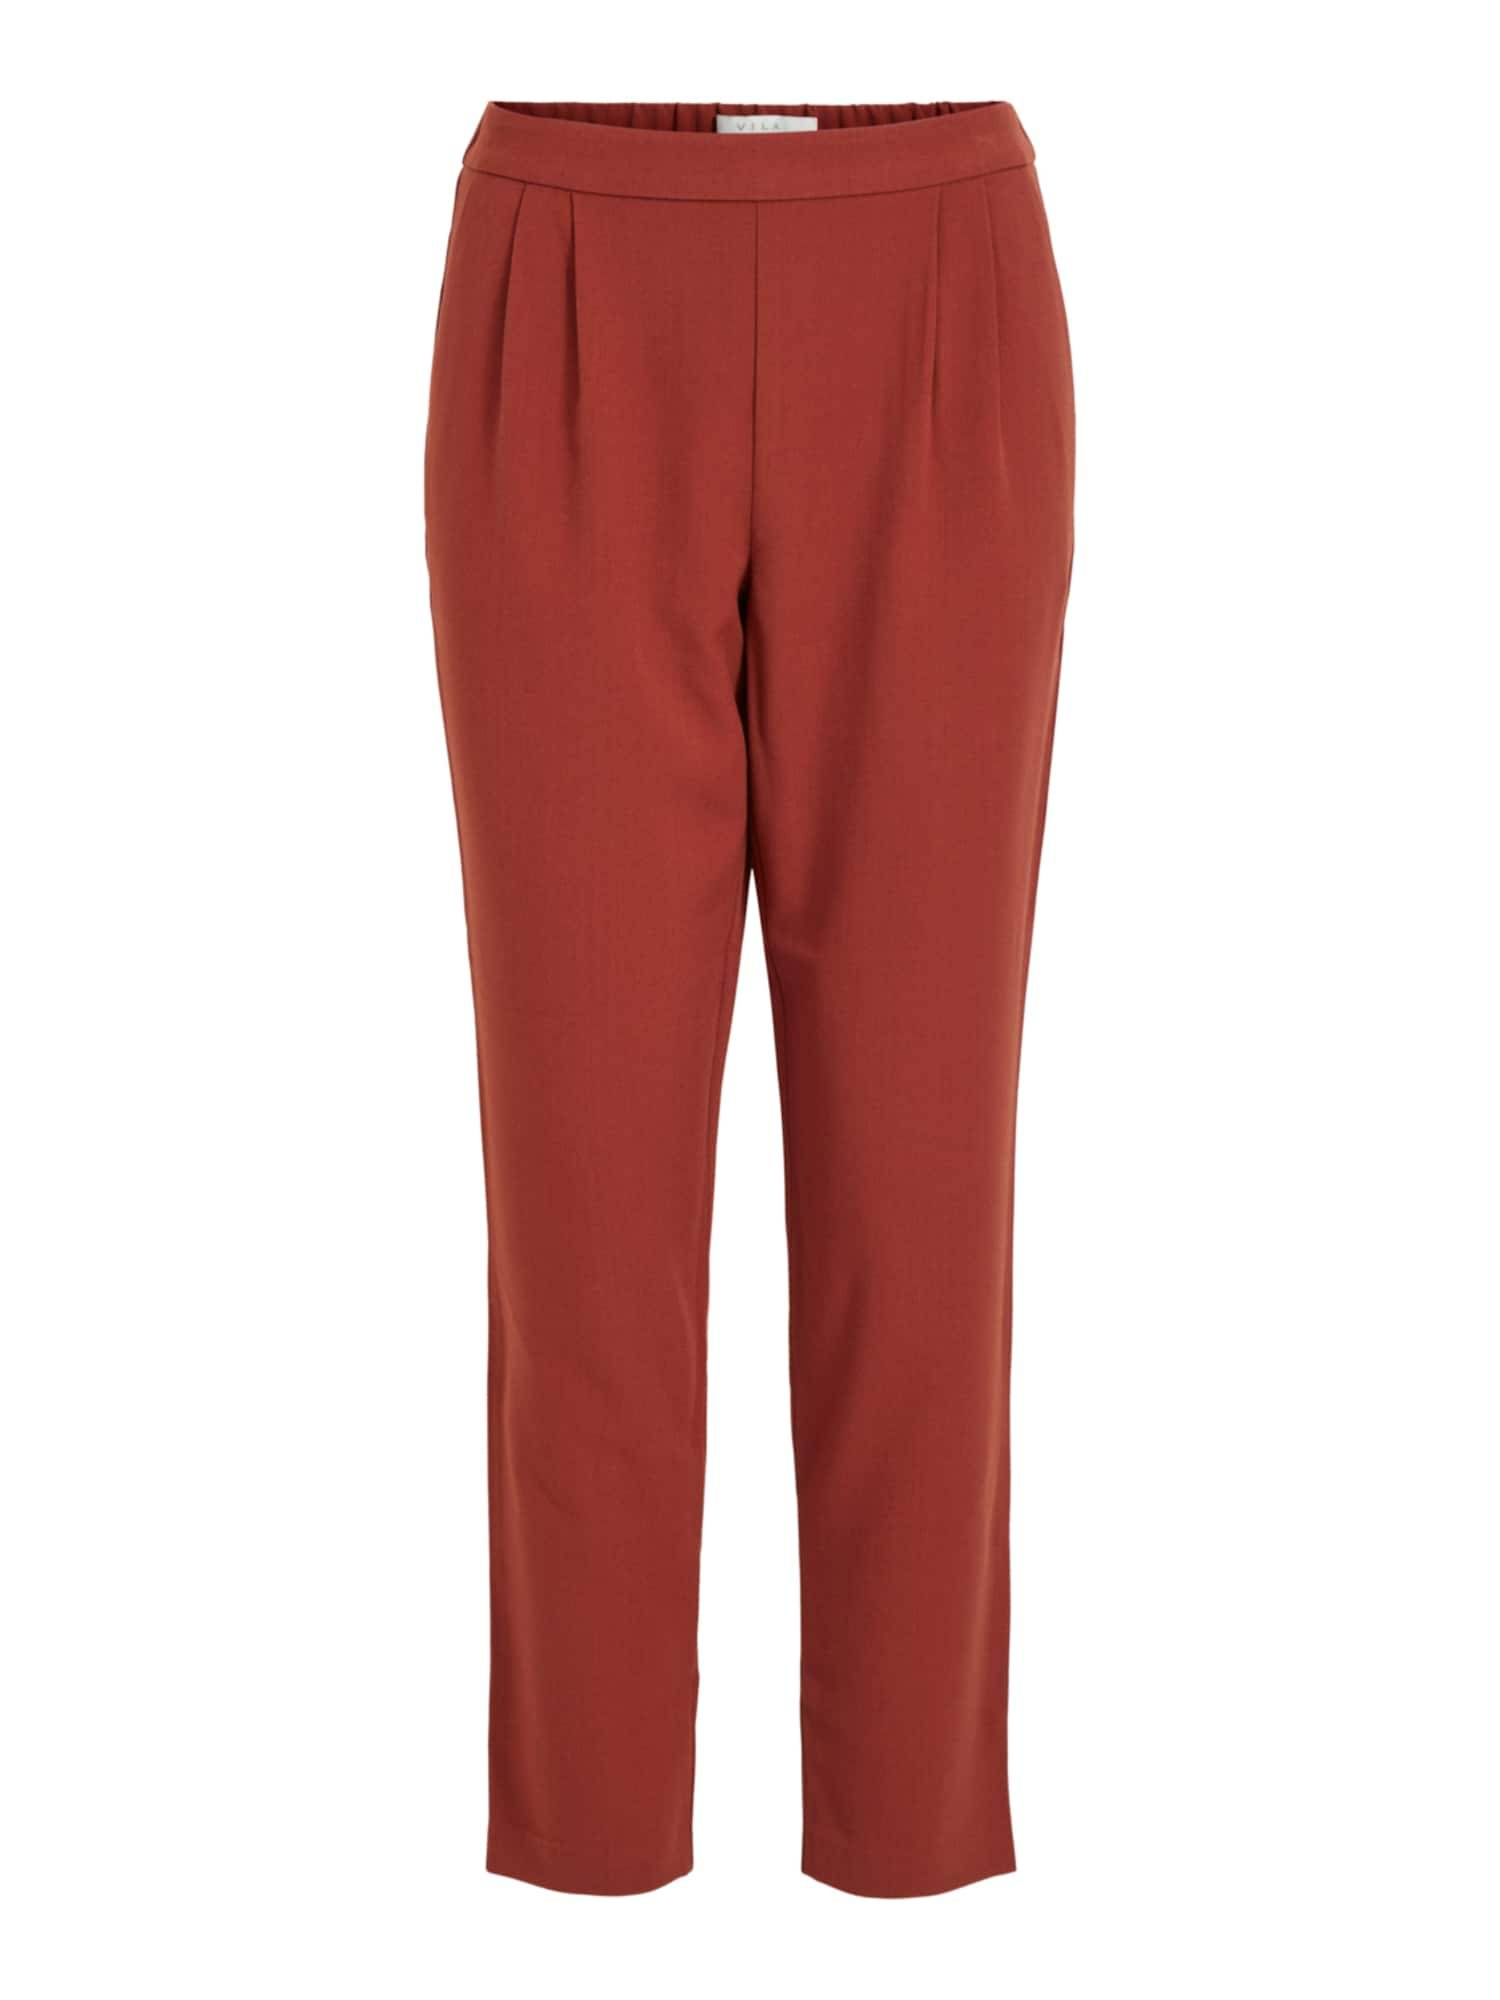 VILA Pantalon à pince 'Titti'  - Rouge - Taille: 40 - female